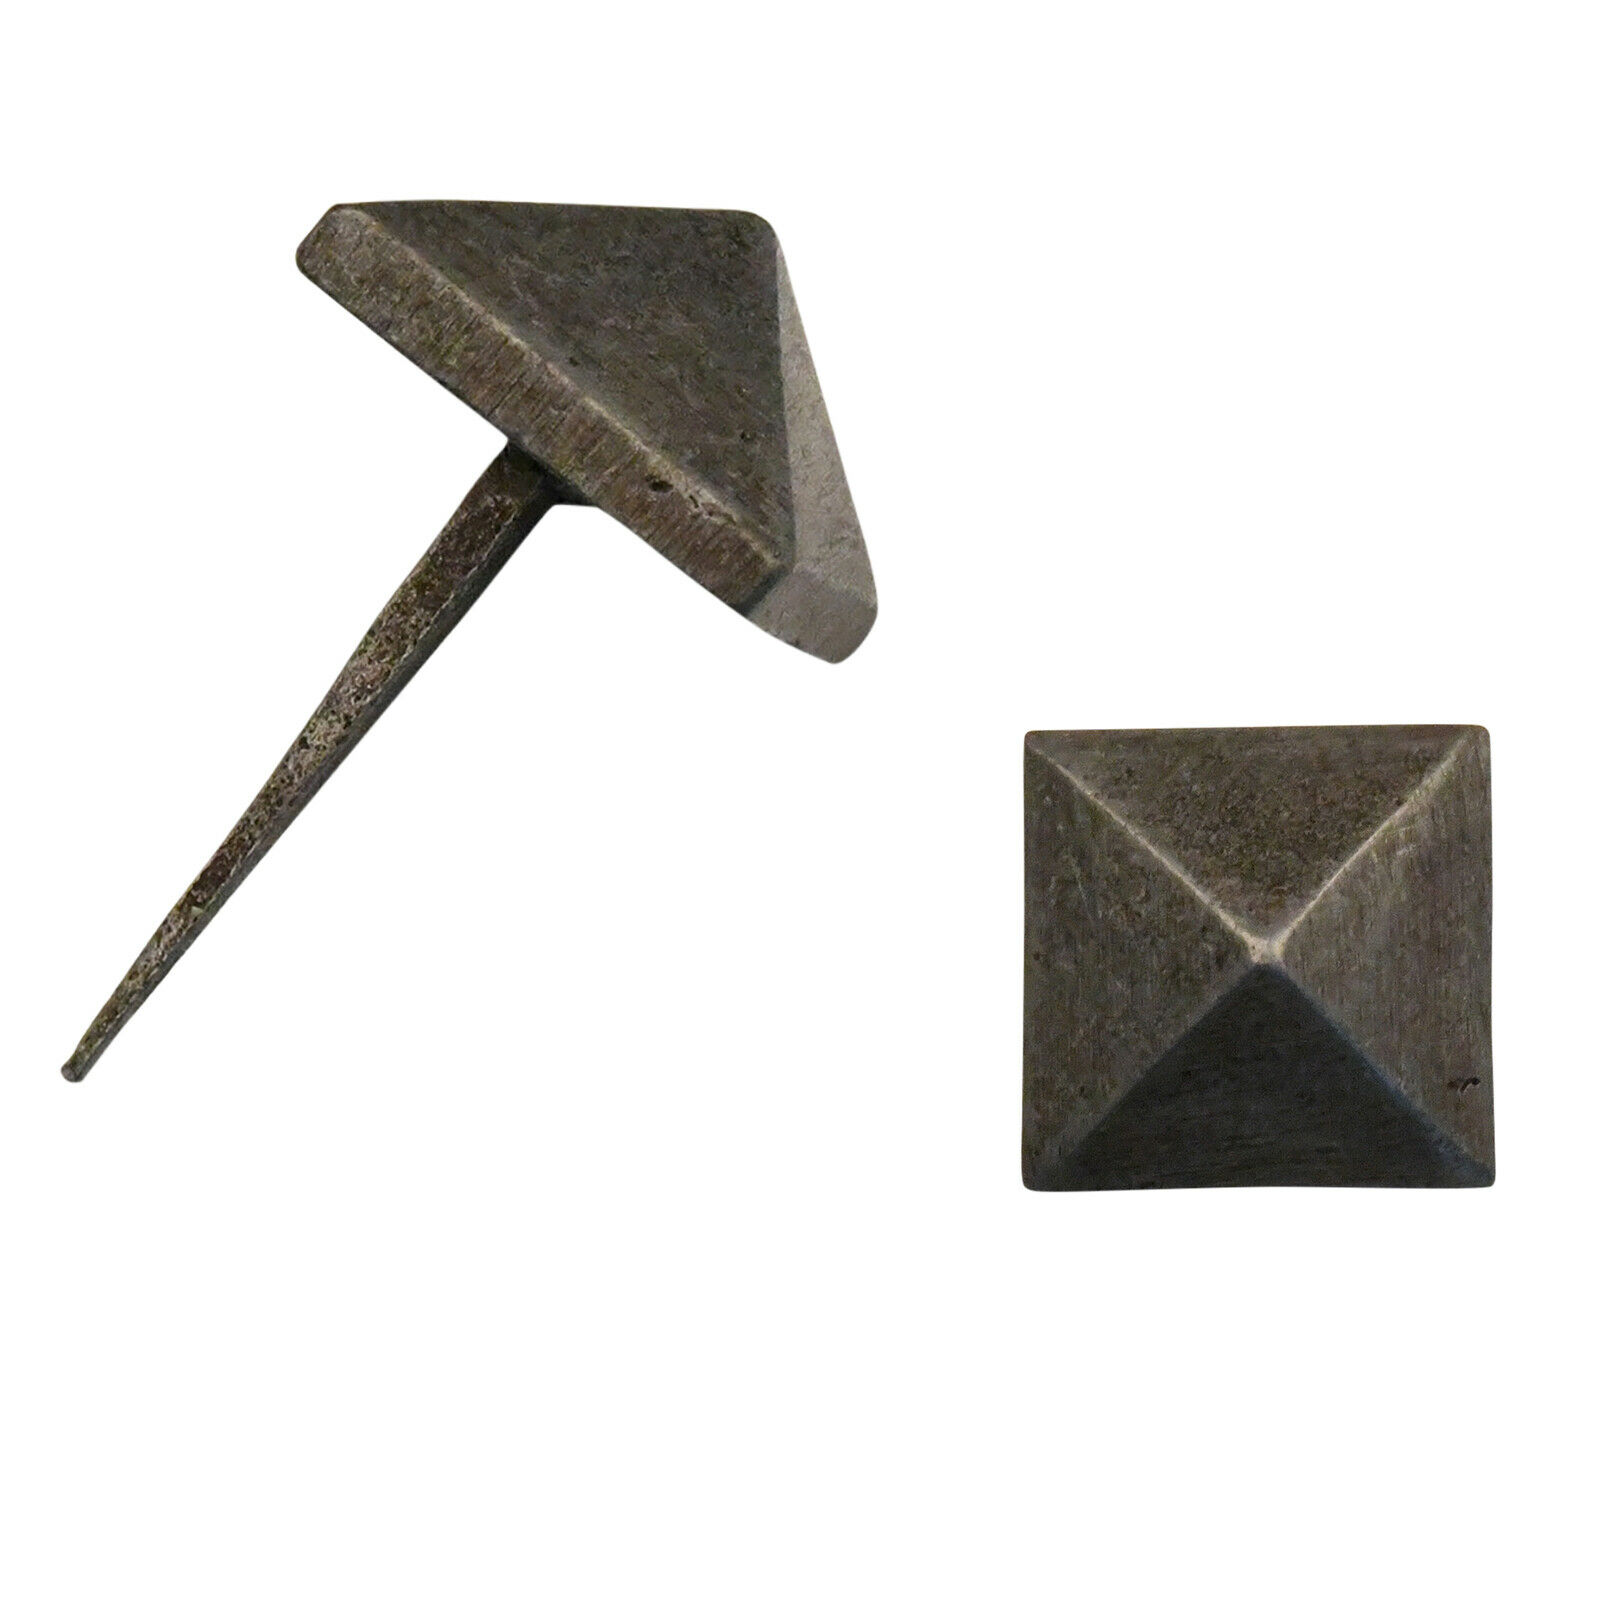 Handgeschmiedet Nägel Eisennägel Mittelalter Nagel antik Viereckig Eckig 65mm